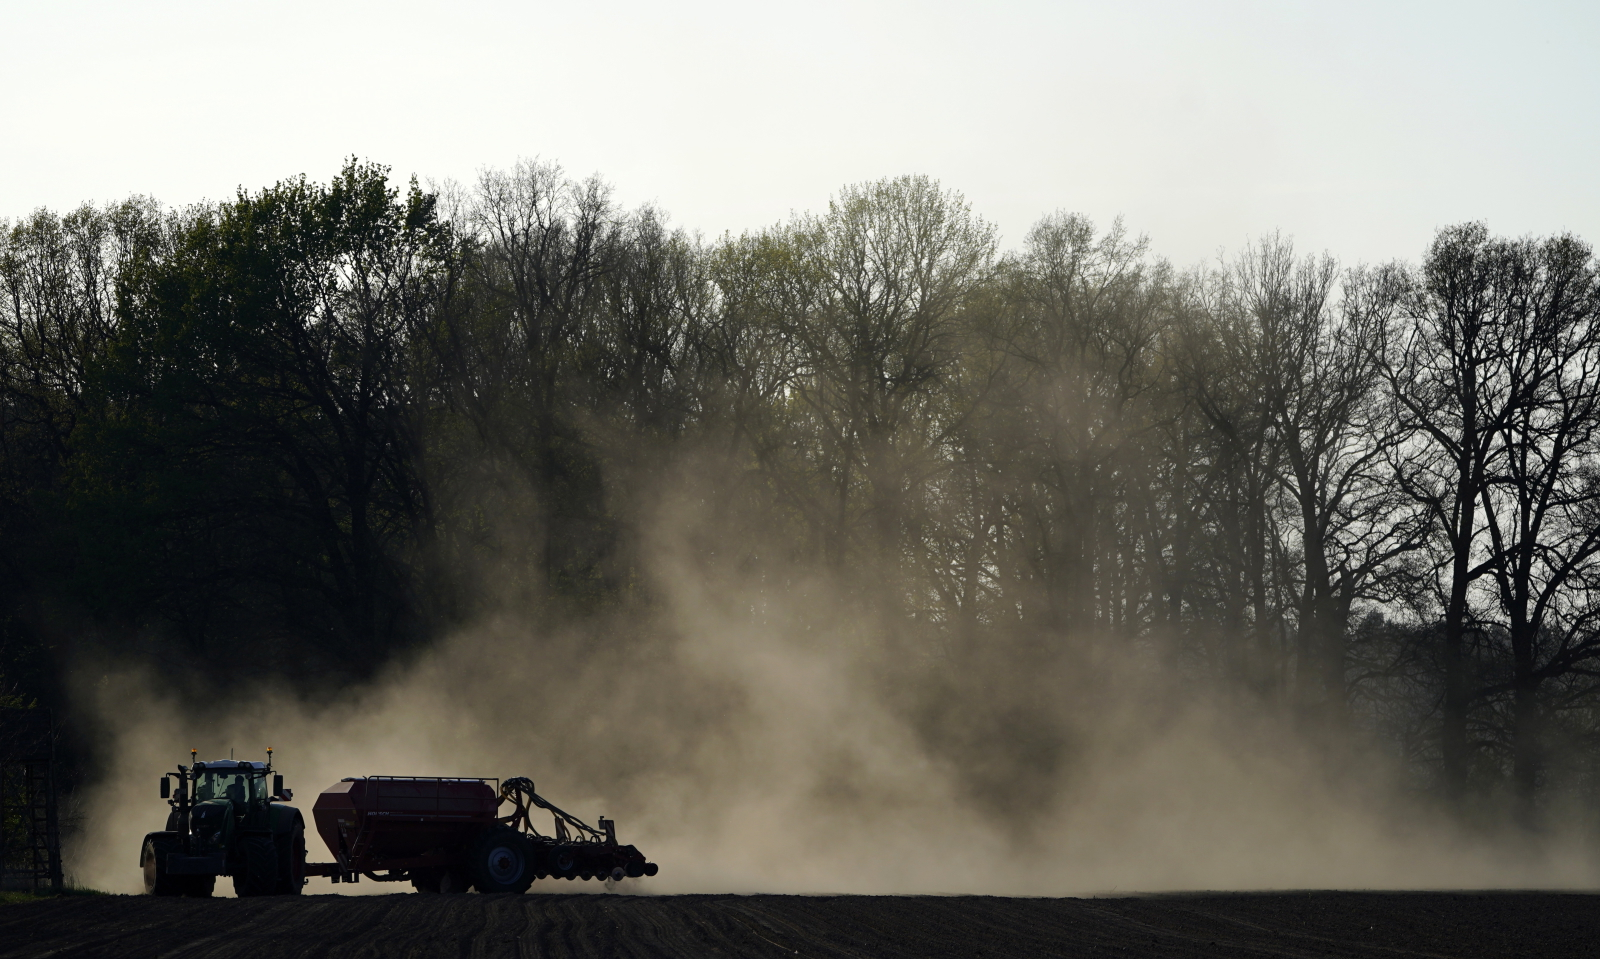 Ogromna susza dotknęła już Brandenburgię/EPA / ALEXANDER BECHER